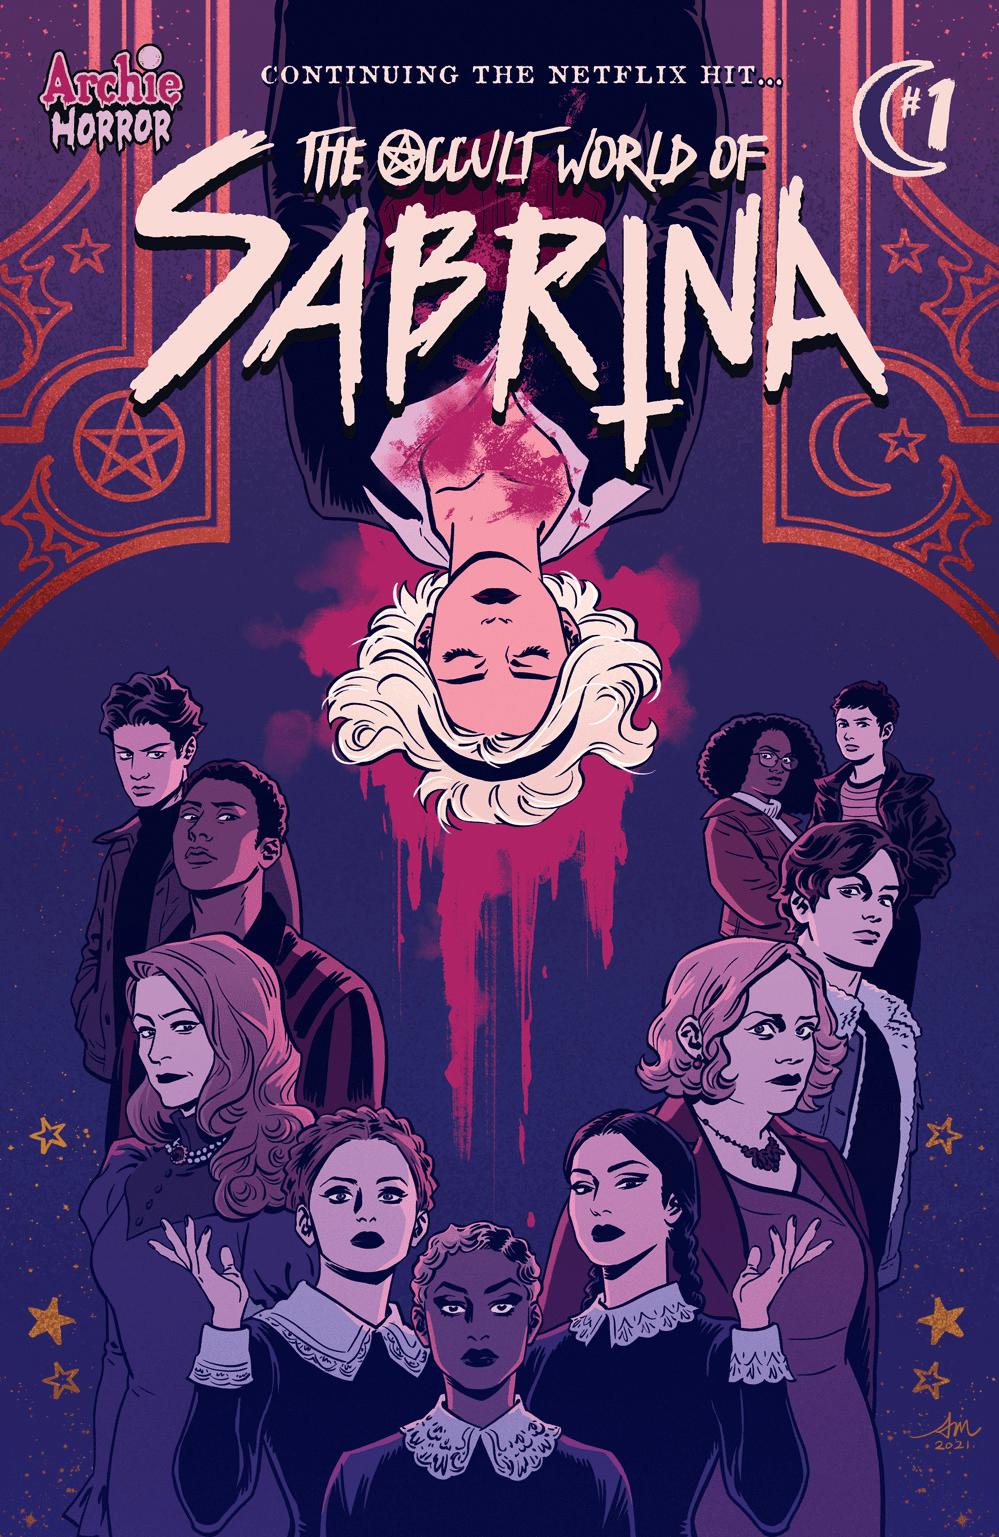 sabrina komiksy occult world